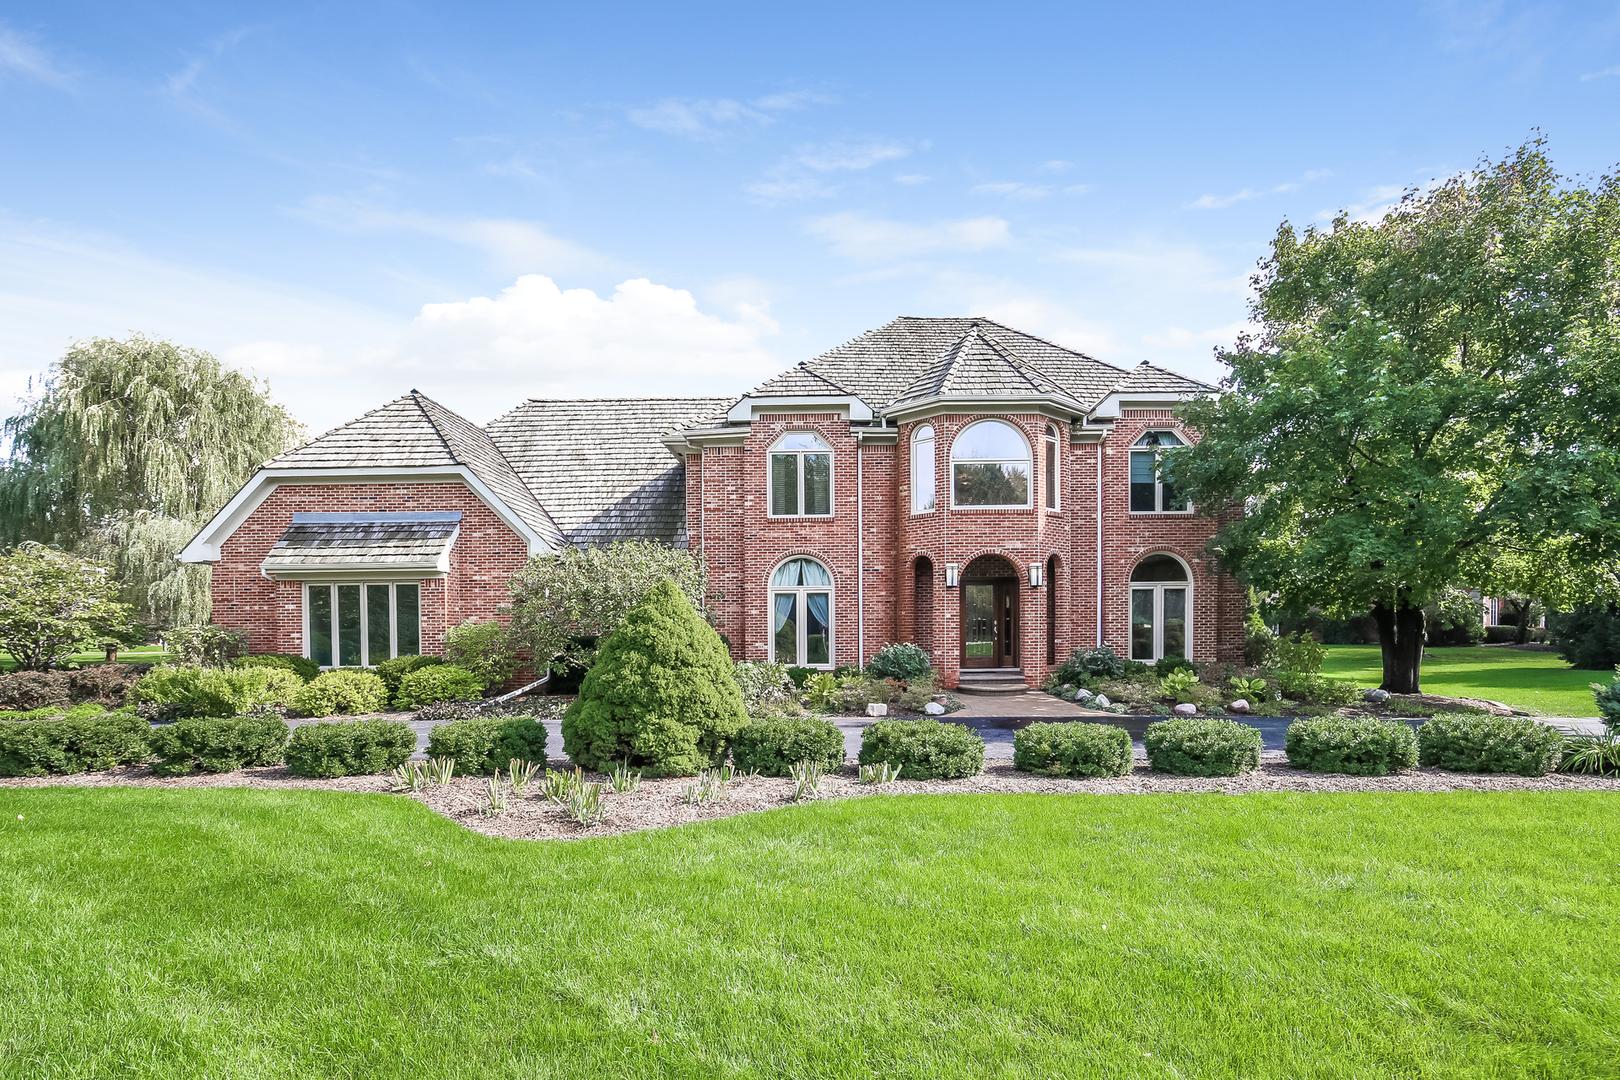 5822 Blue Heron Drive, Long Grove, Illinois 60047